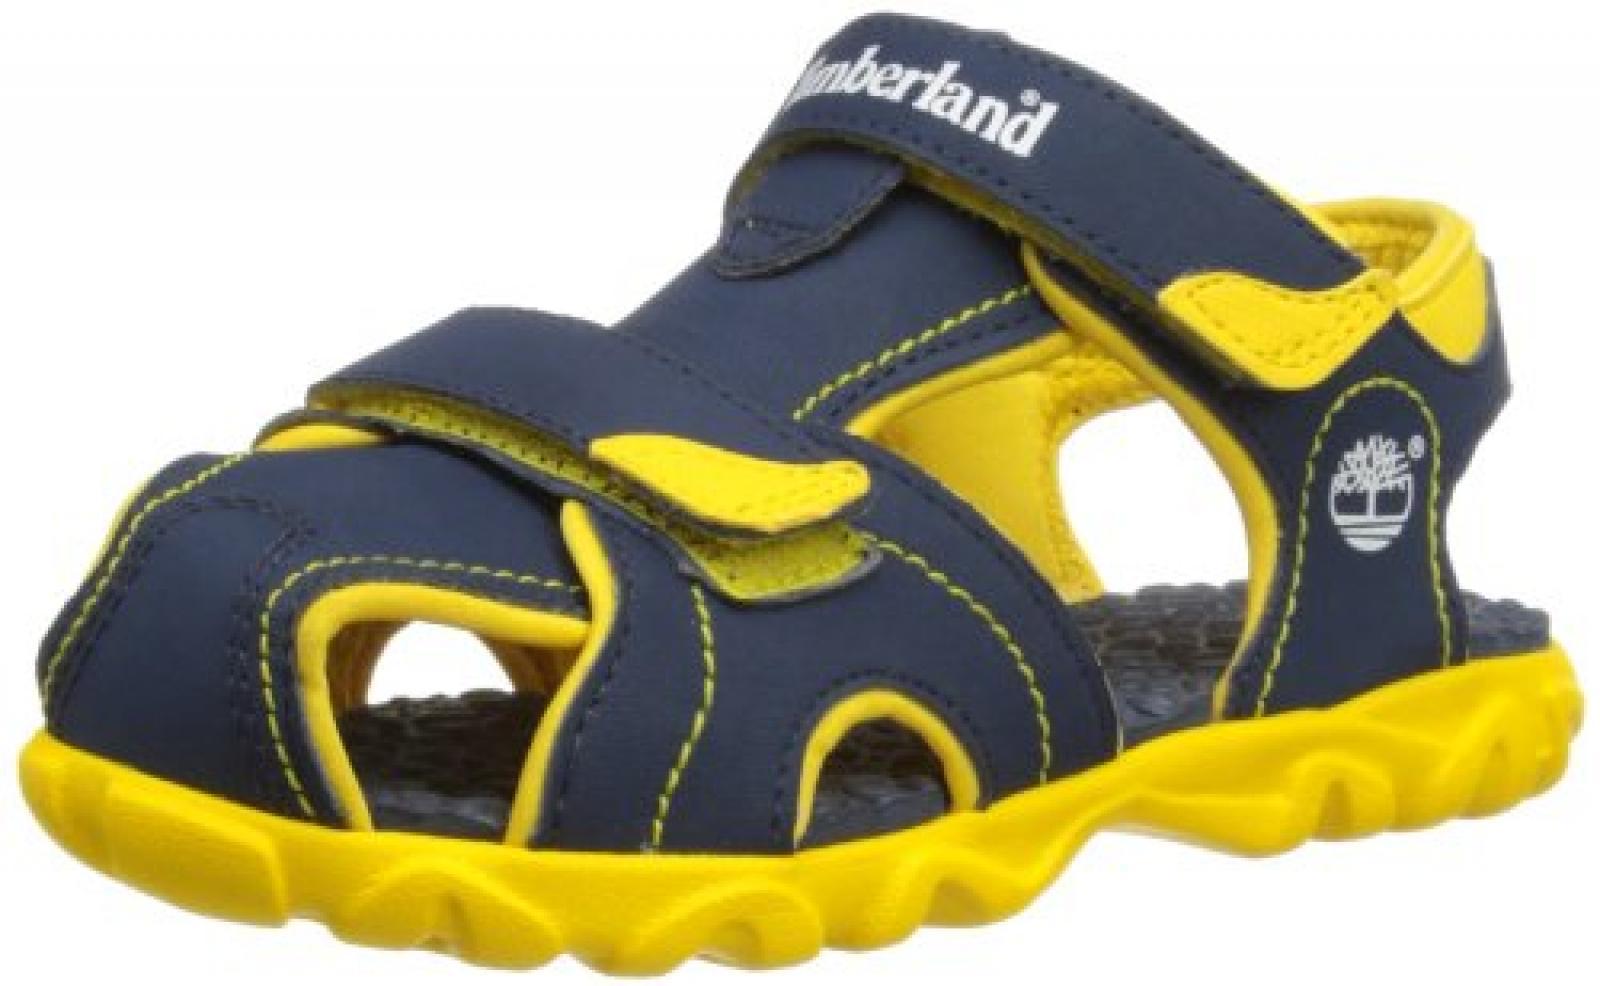 Timberland SPLSHTWNCLSDTOESND Unisex-Kinder Sport- & Outdoor Sandalen